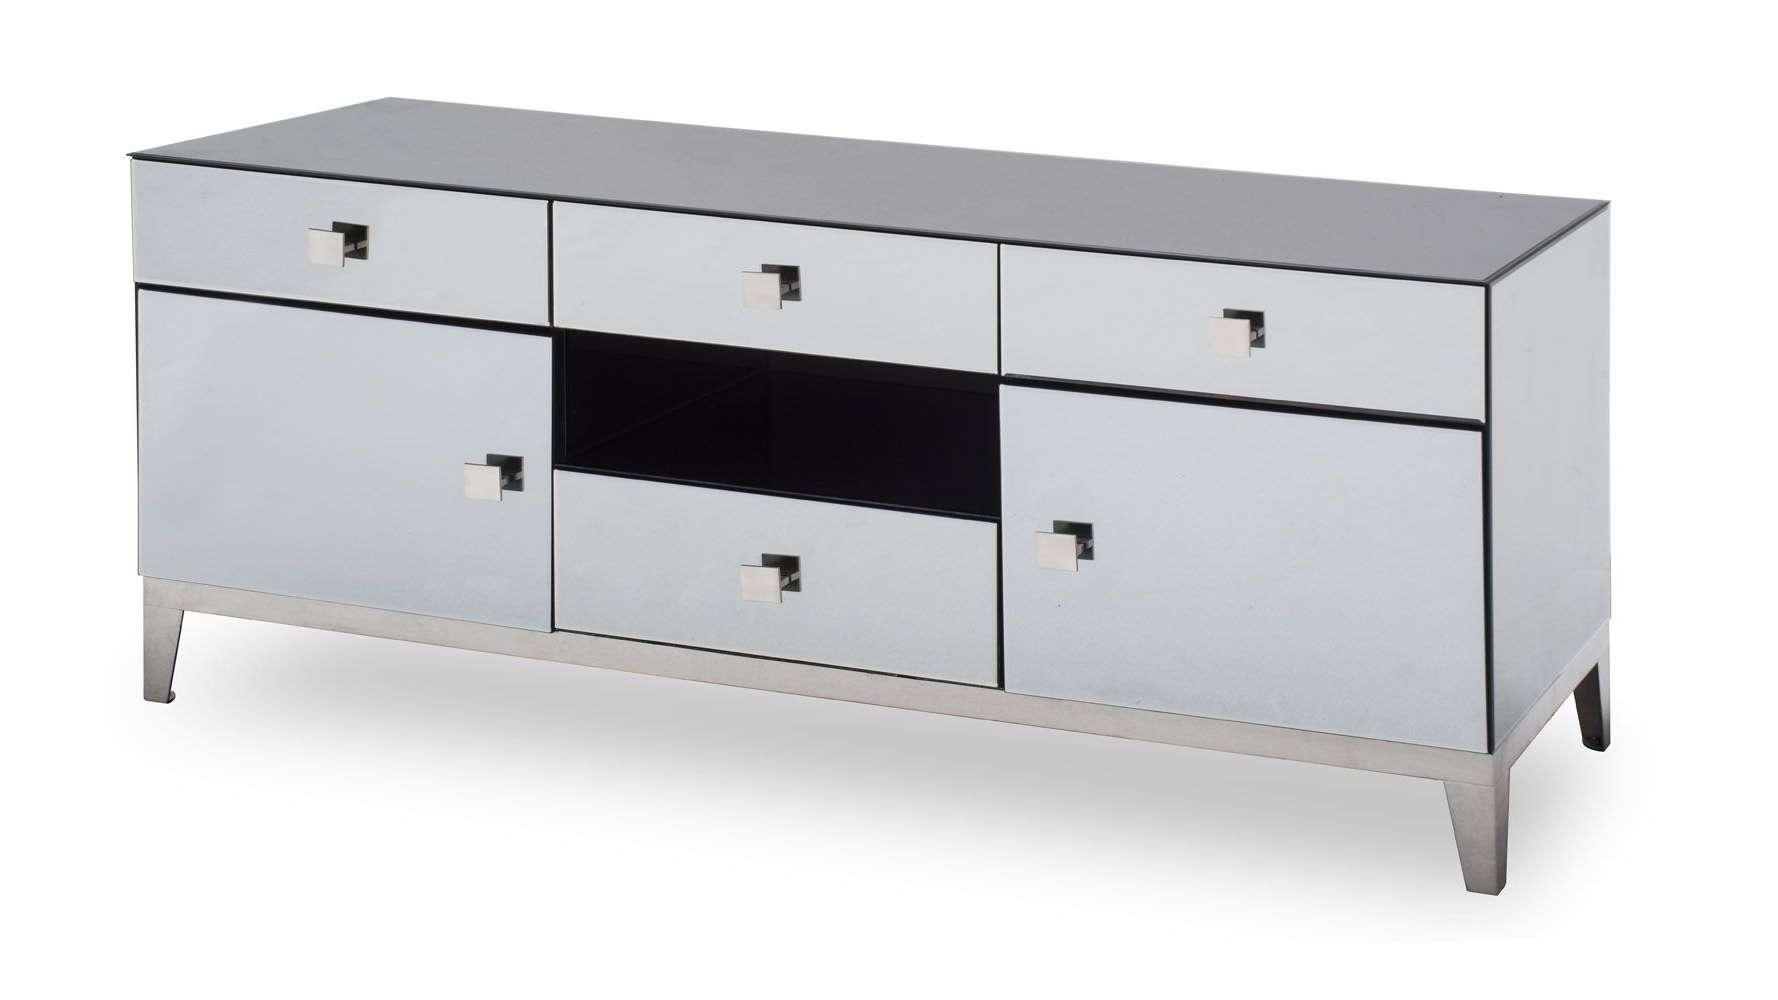 Modern Grey Mirrored Glass Berlin Tv Stand | Zuri Furniture Regarding Mirrored Tv Cabinets (View 12 of 20)